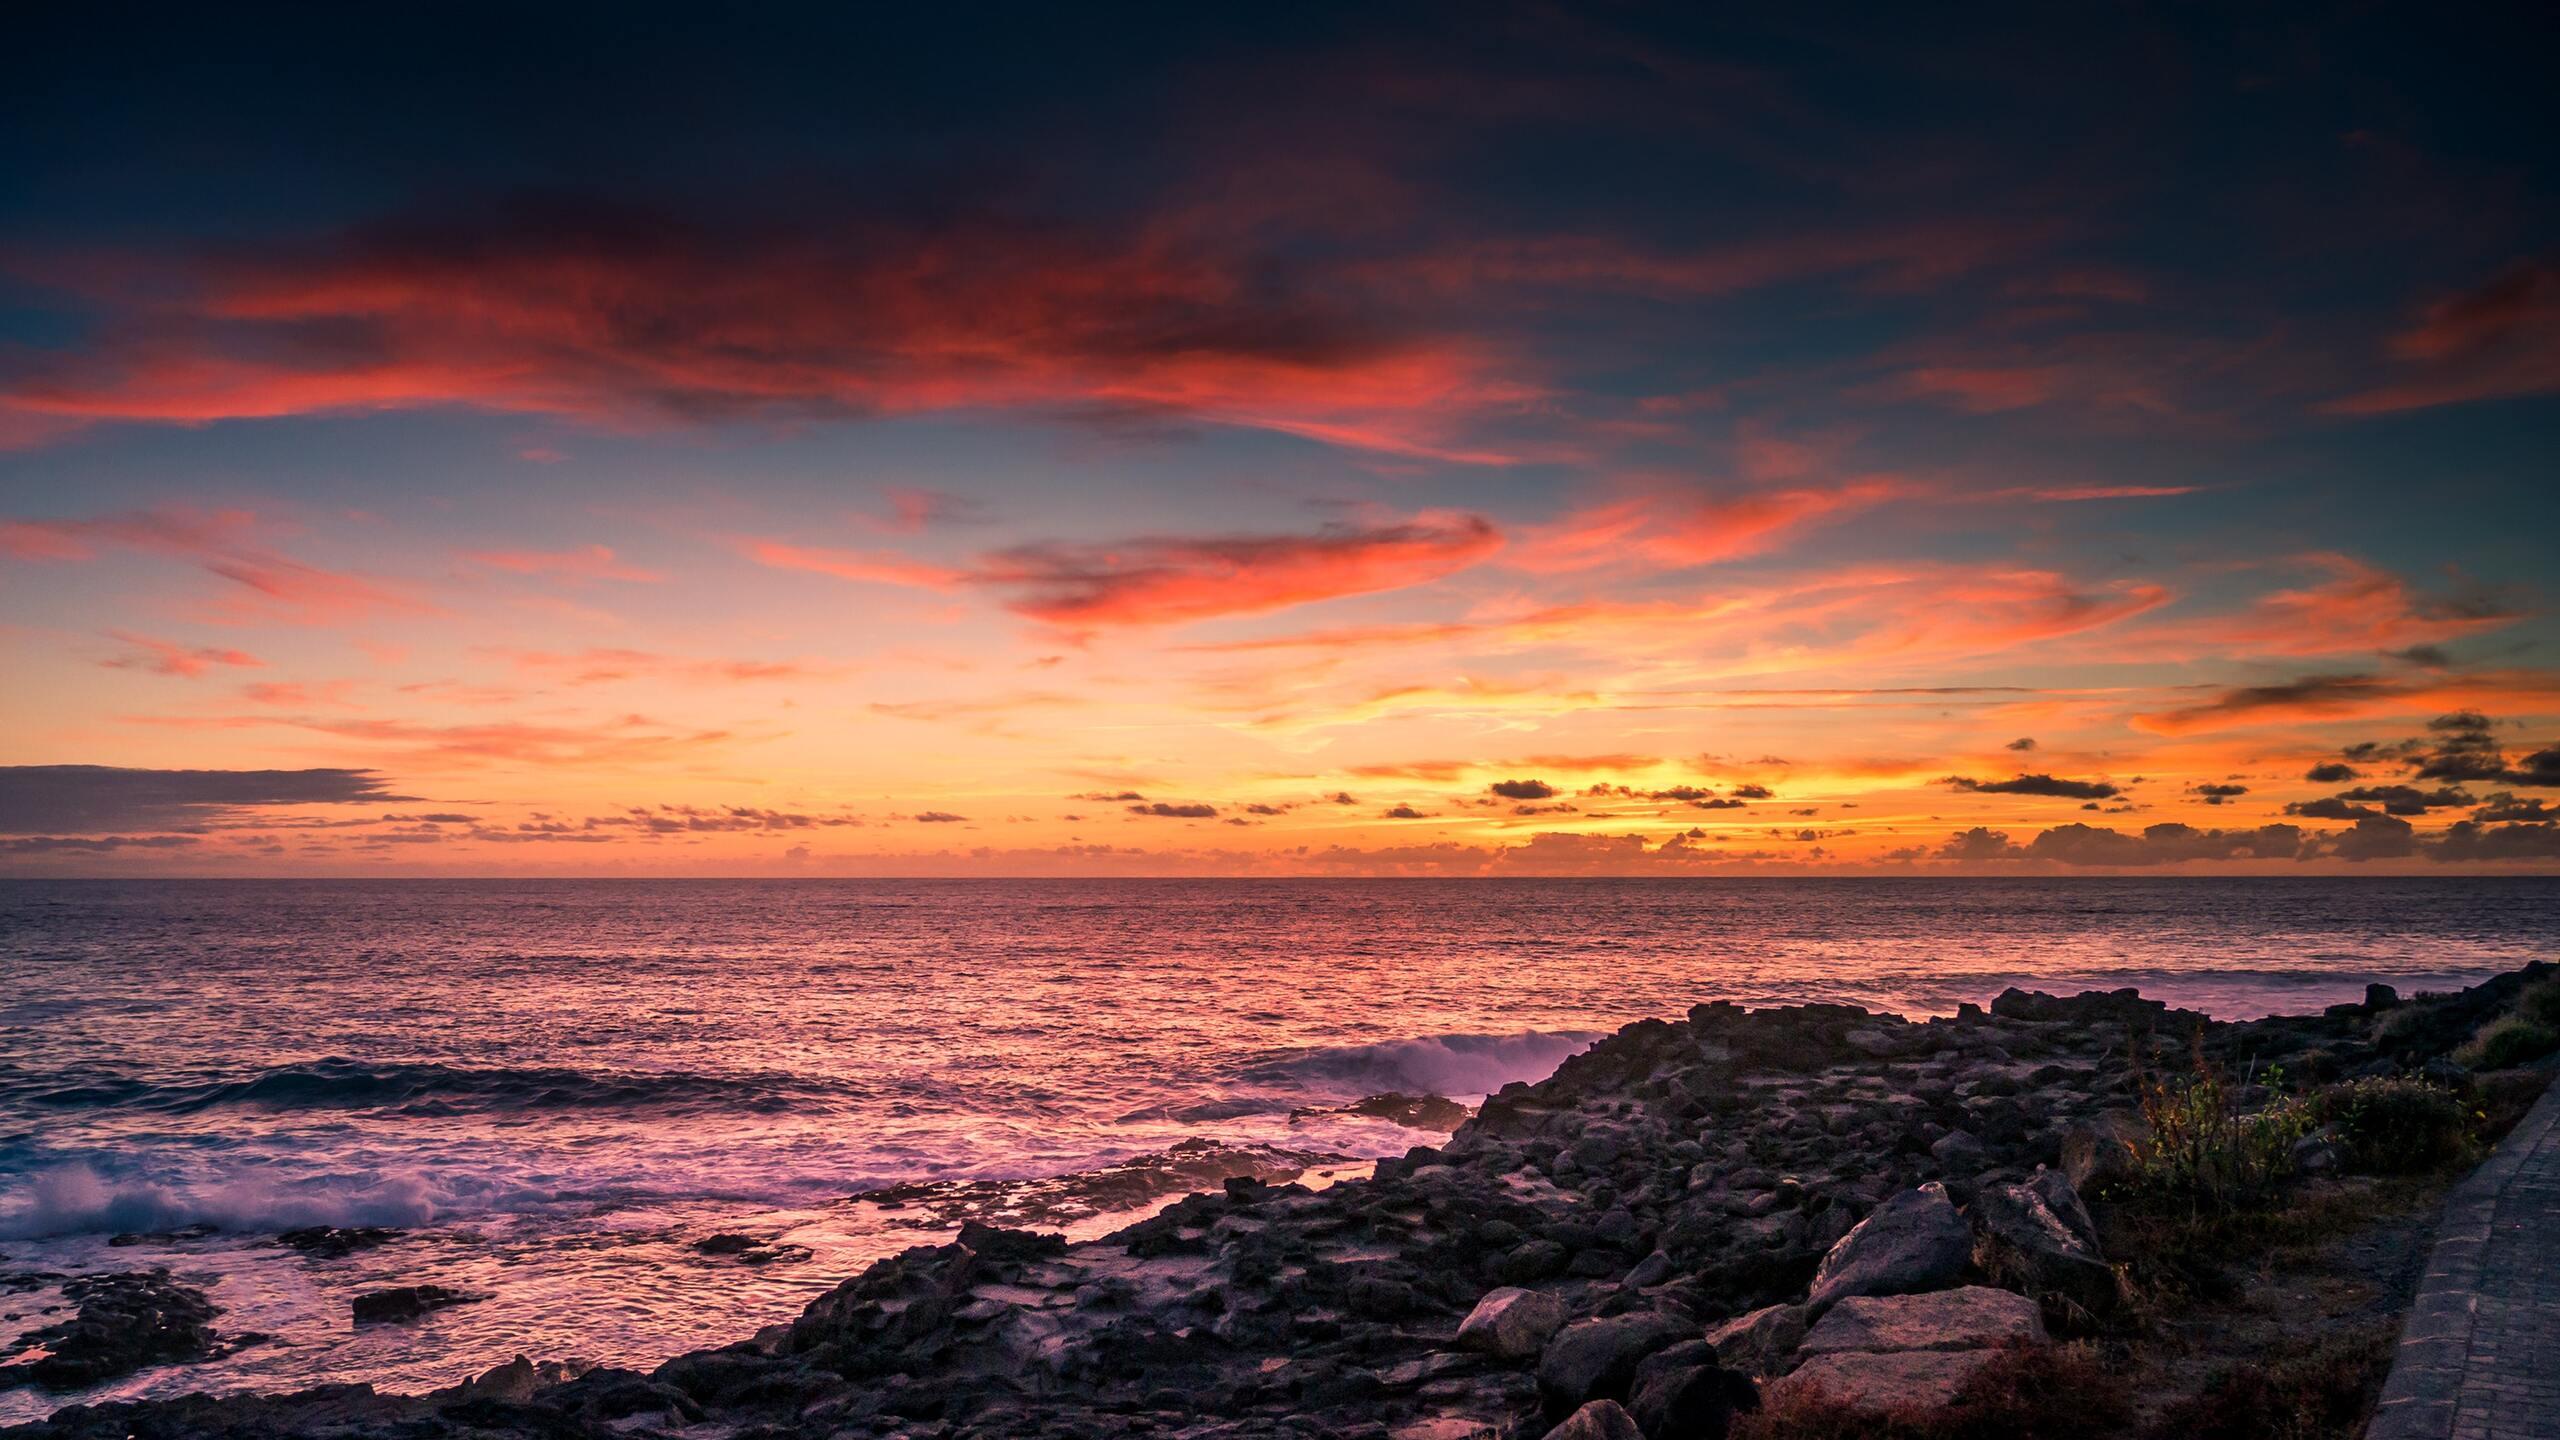 scenic-view-of-beach-in-evening-jz.jpg